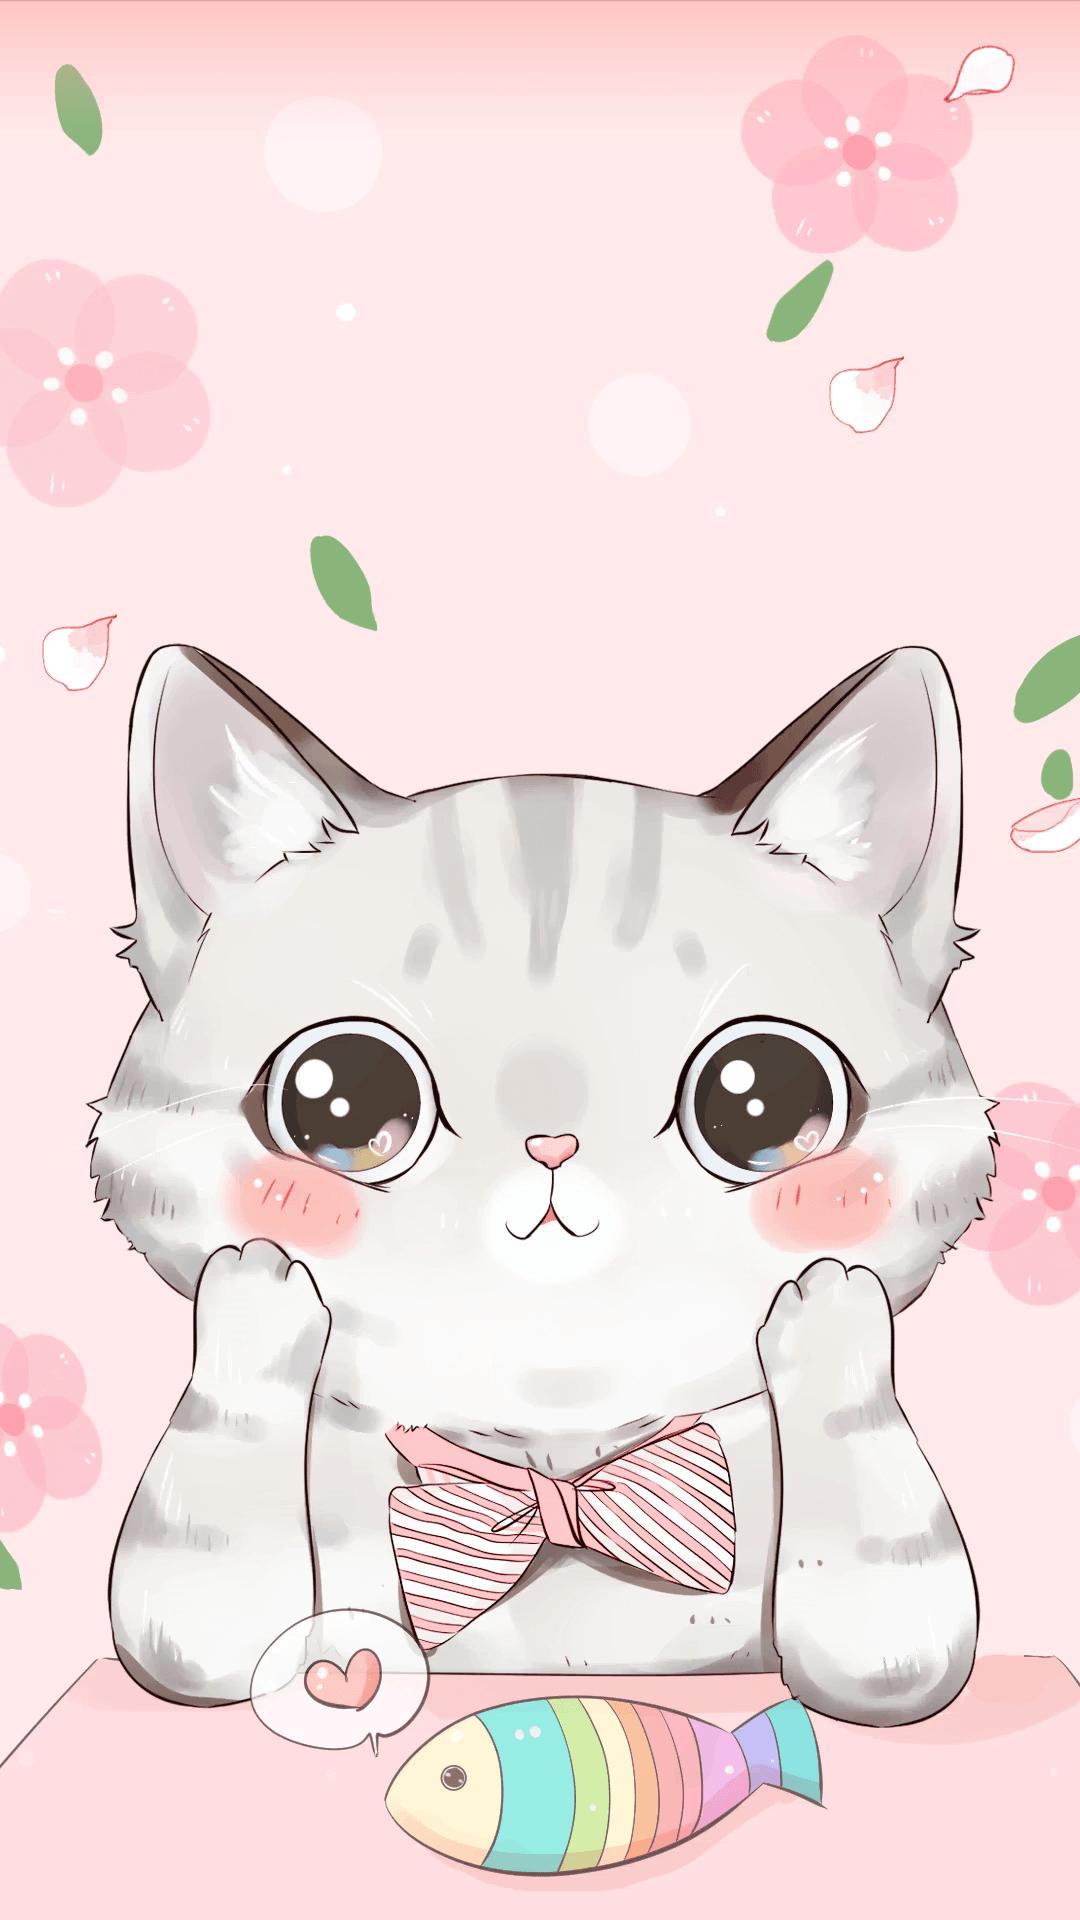 50 Cartoon Pink Cats Wallpapers Download At Wallpaperbro Munchkincat Cute Cat Wallpaper Cute Cartoon Wallpapers Iphone Wallpaper Cat